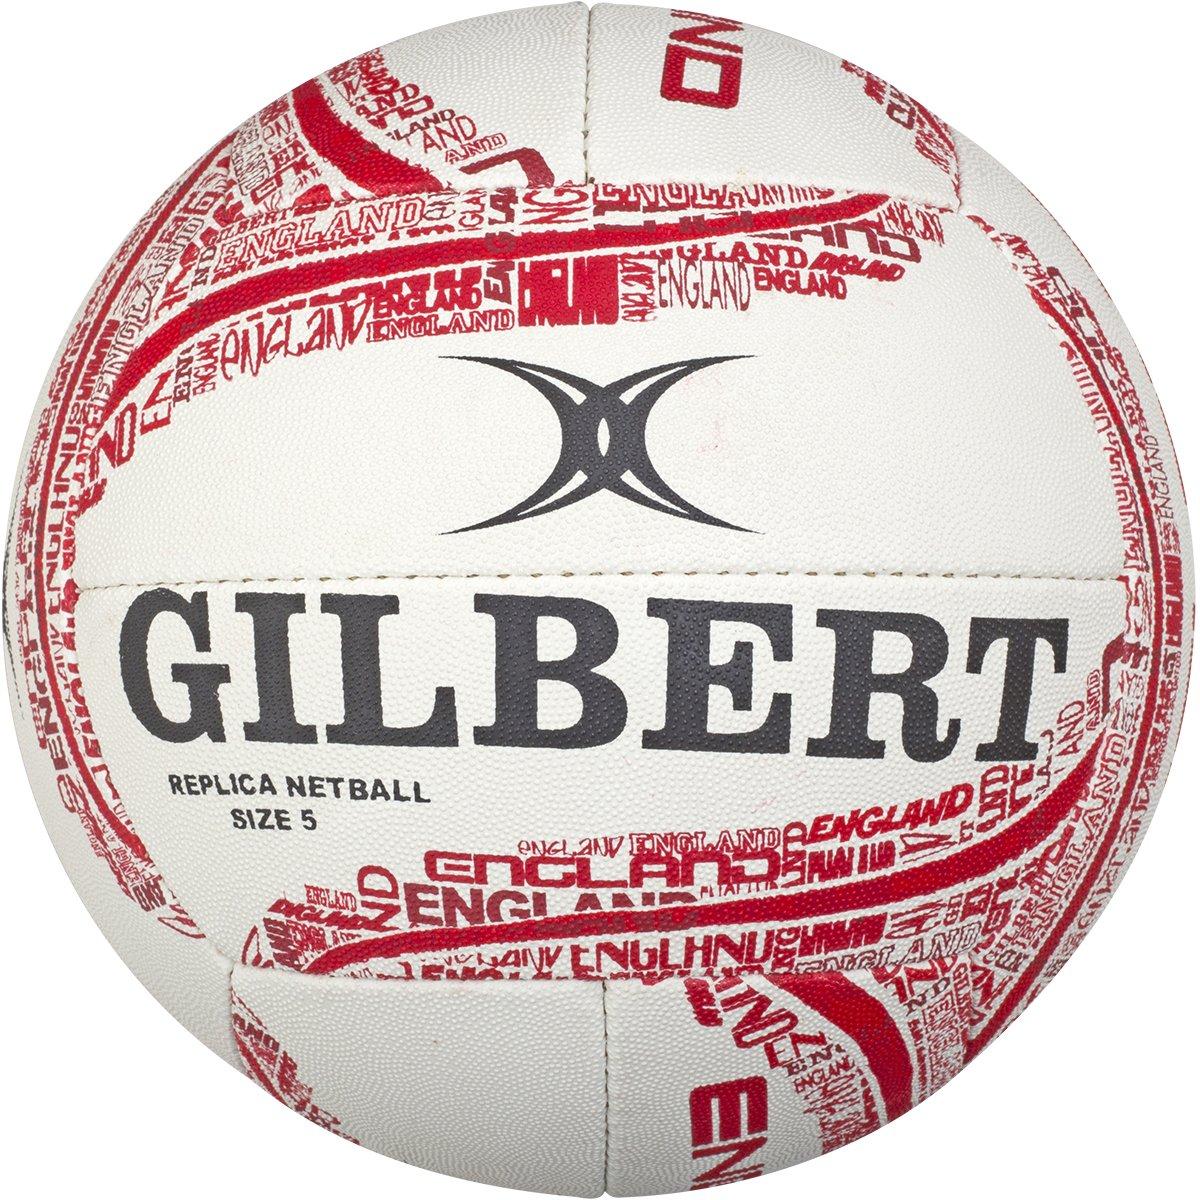 England Replica Netball - Red/White Gilbert